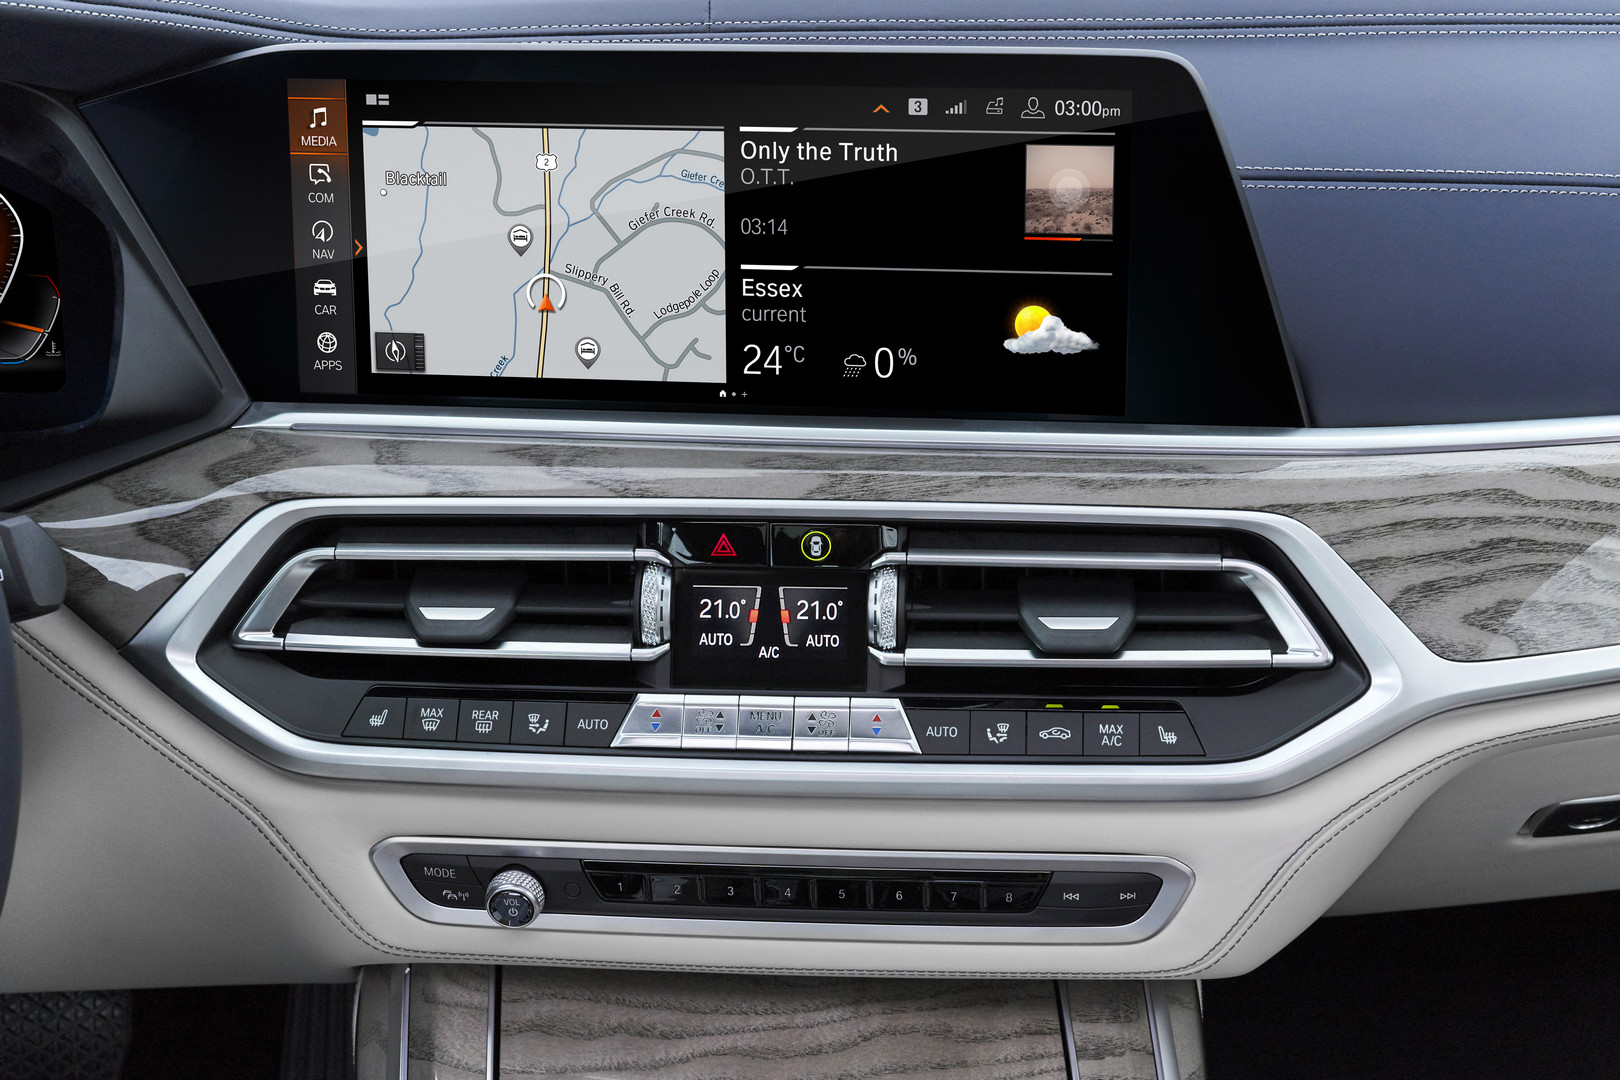 2019 BMW X7 Interface Screen